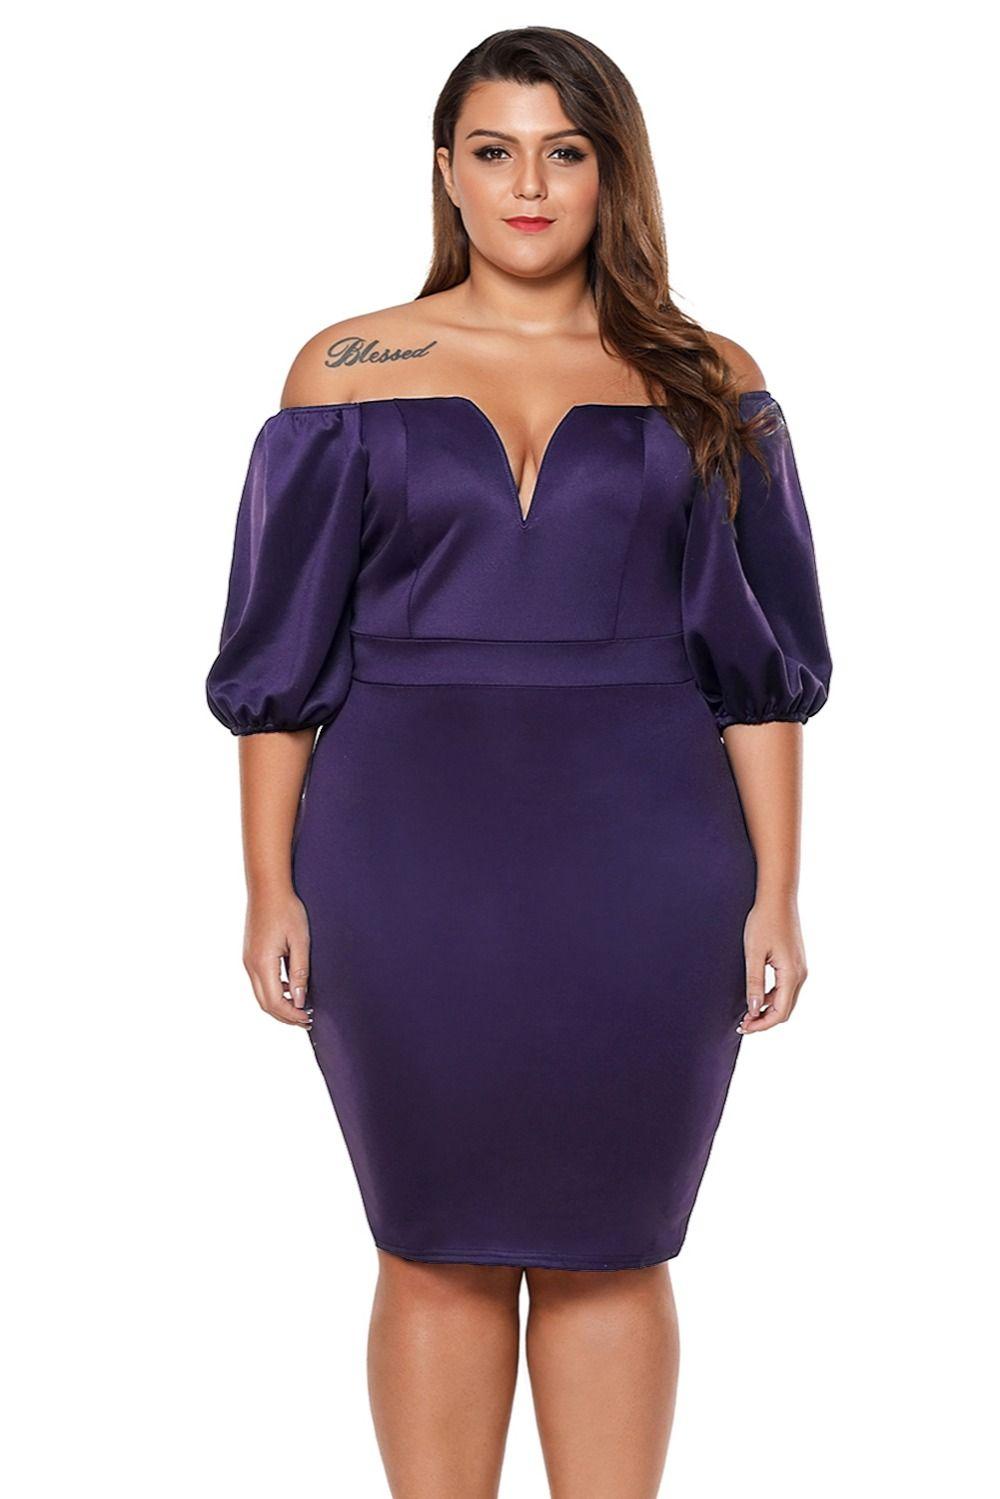 3b4ef36623ff Summer Dresses 2018 Fashion Plum Queen Style Short Puff Sleeve Plus Size  Bodycon Dress Vestidos Robe Femme LC220271 Women Clothing Dresses Shop For  Womens ...